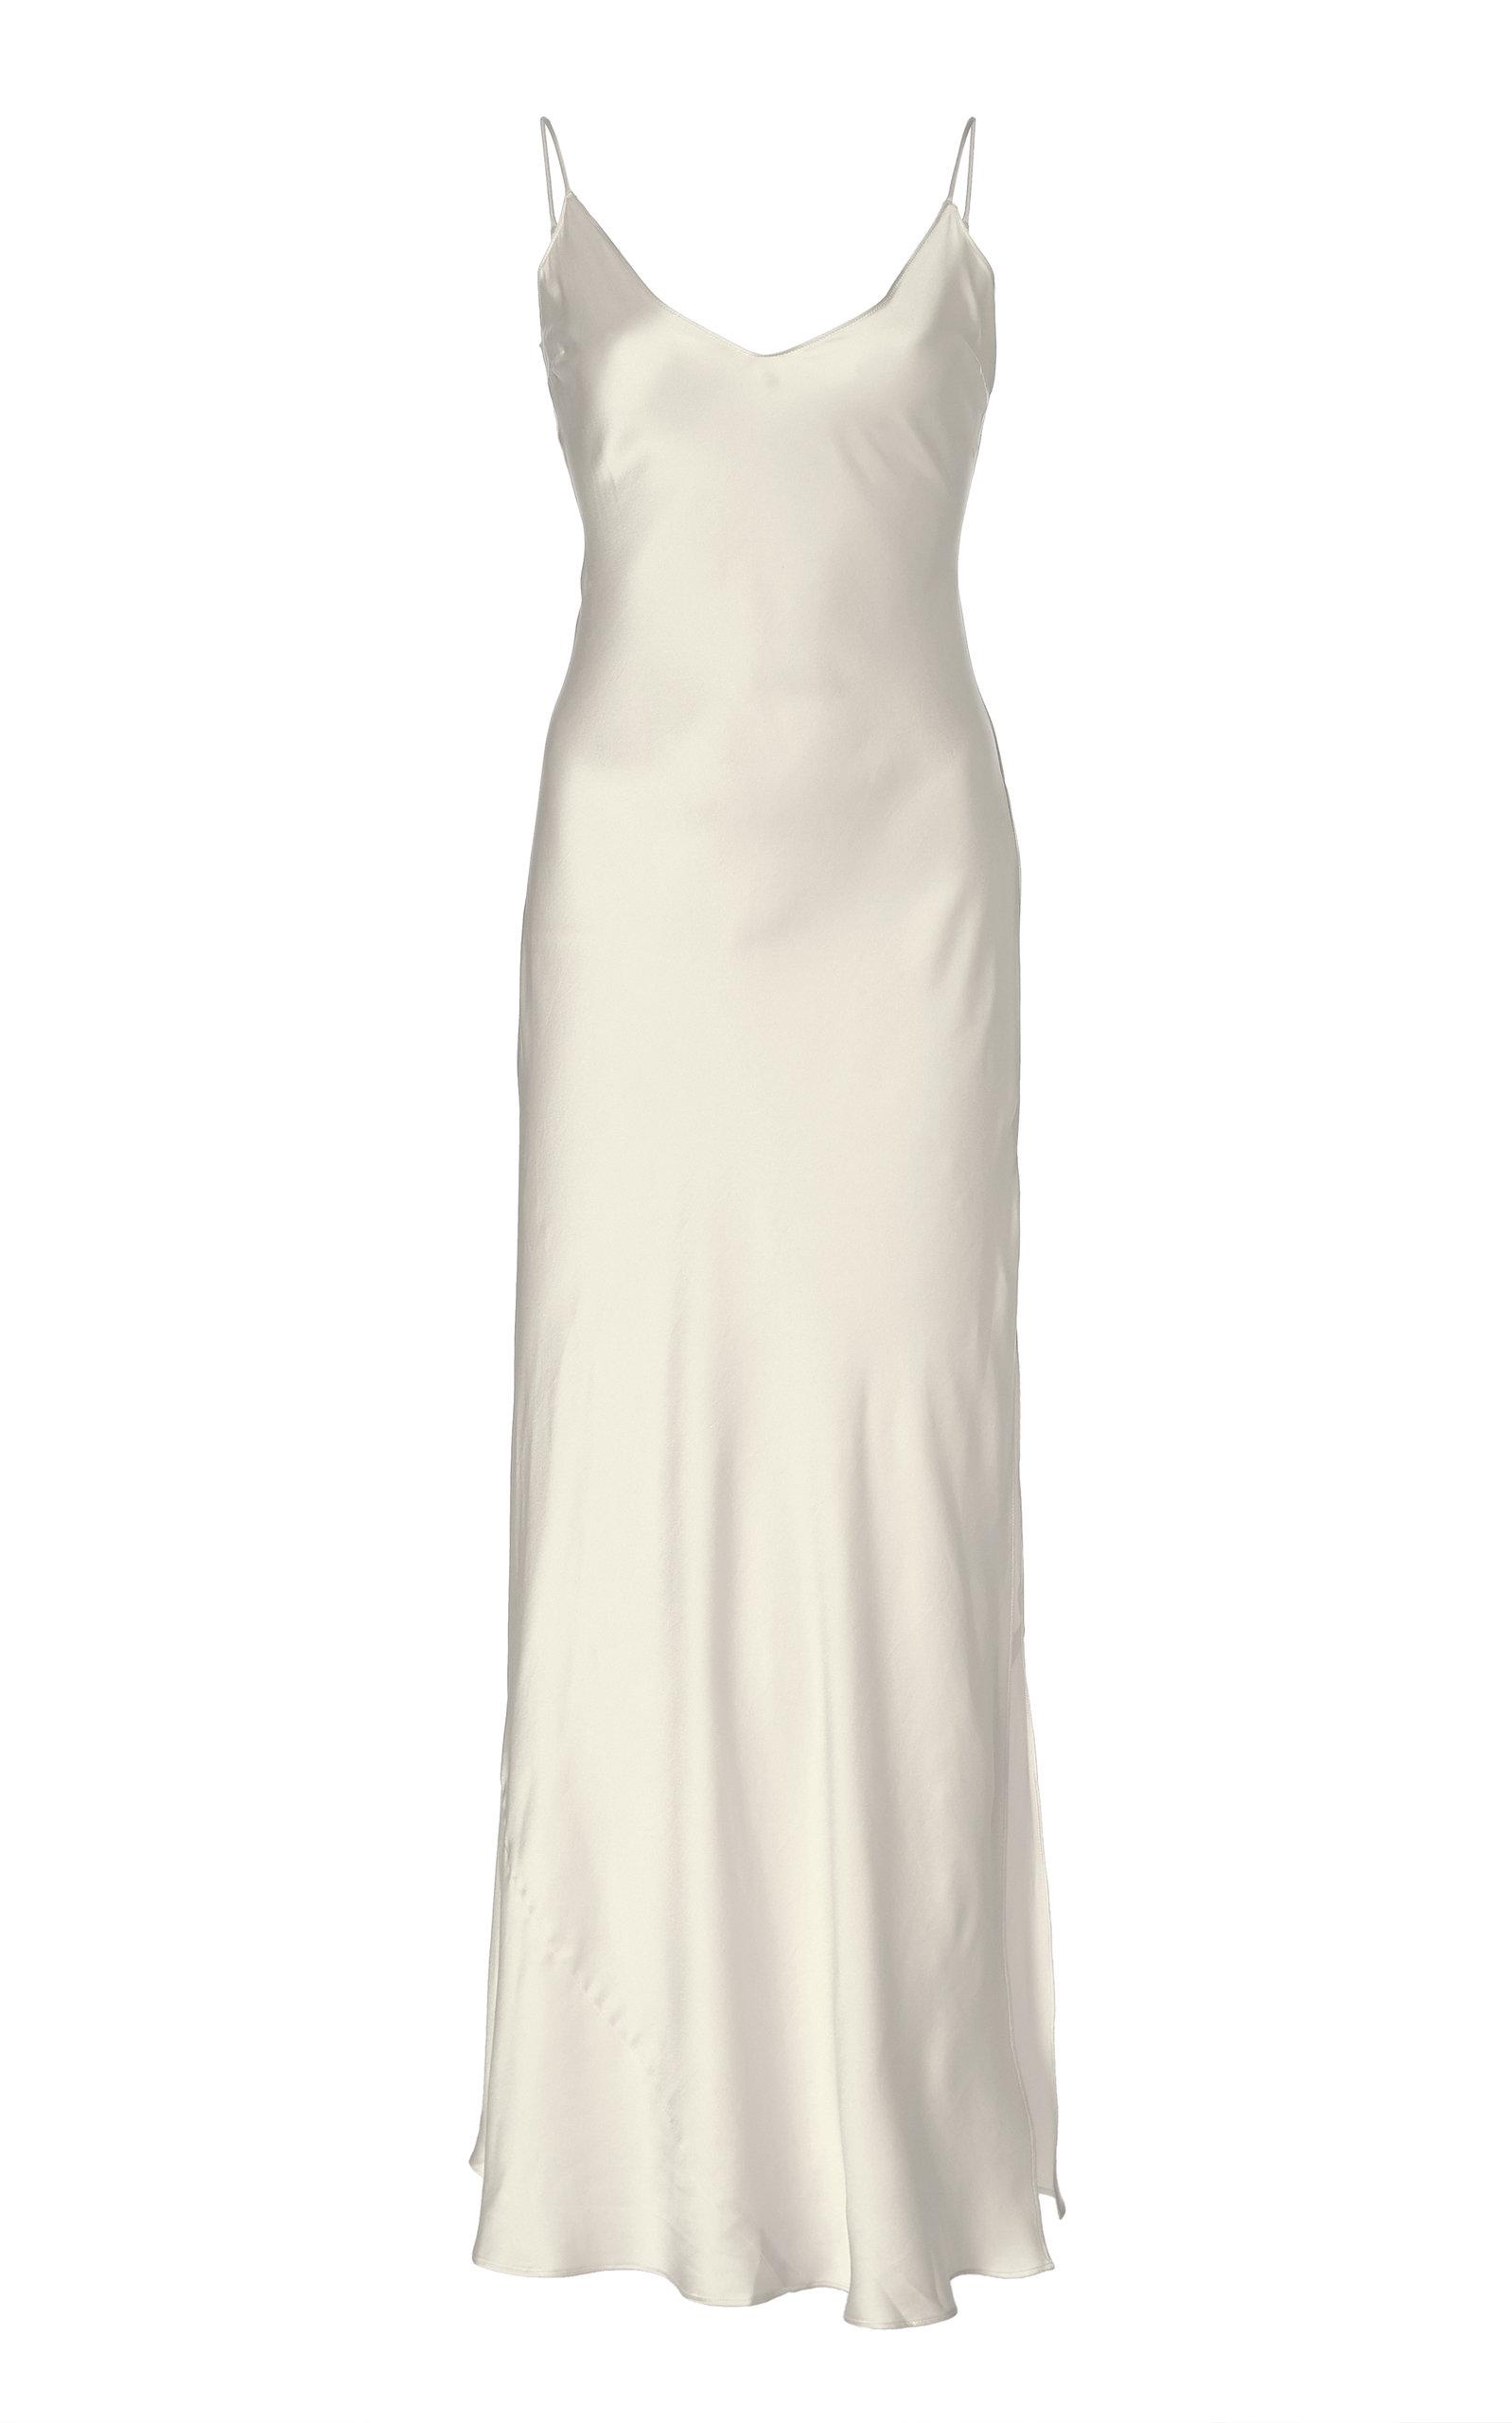 d88c82ba6261 Mossy Silk Sleeveless Slip Dress by Dannijo   Moda Operandi